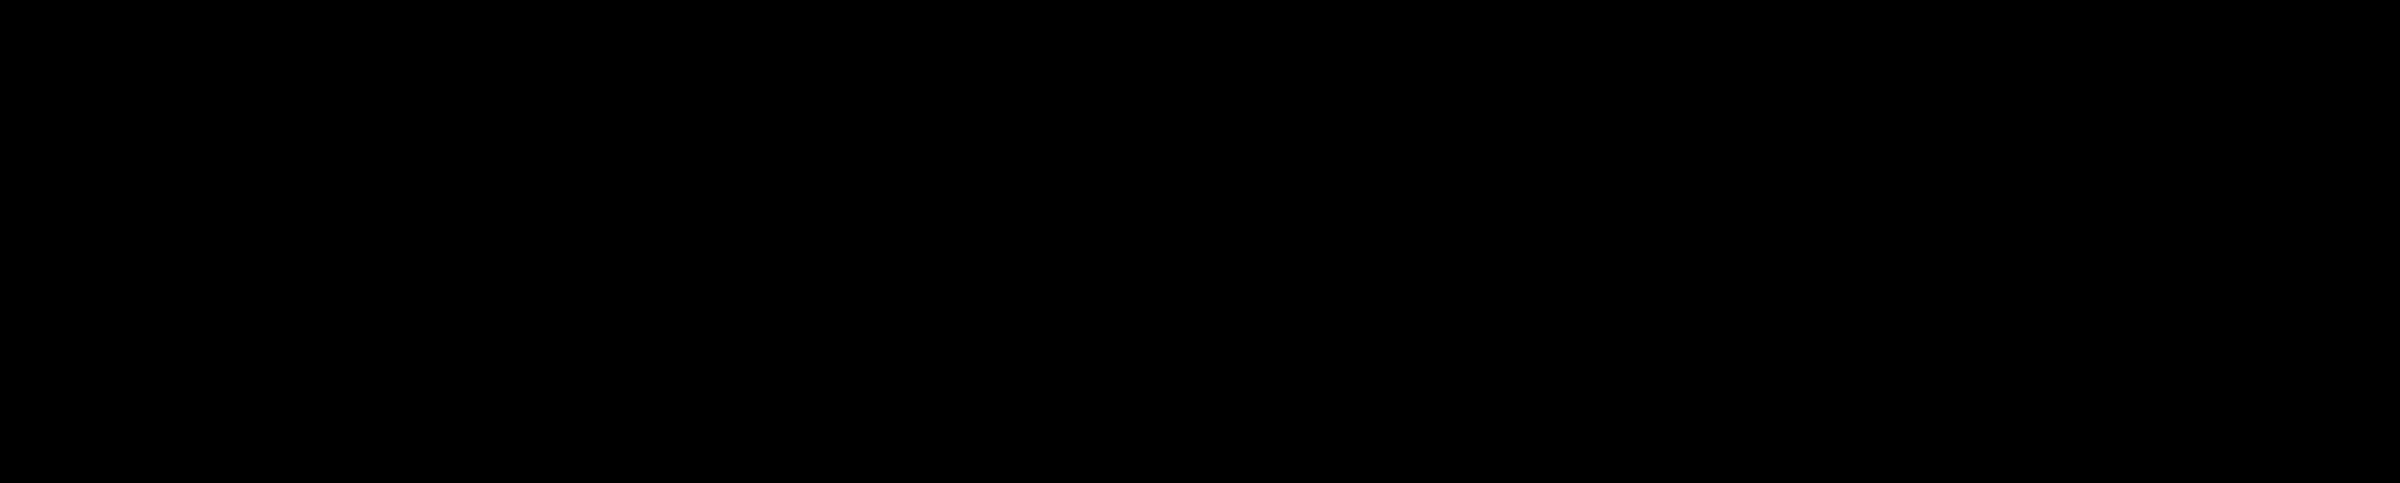 Iec Clipart Clipground Electronic Circuit Symbols Rsa Resistor Symbol